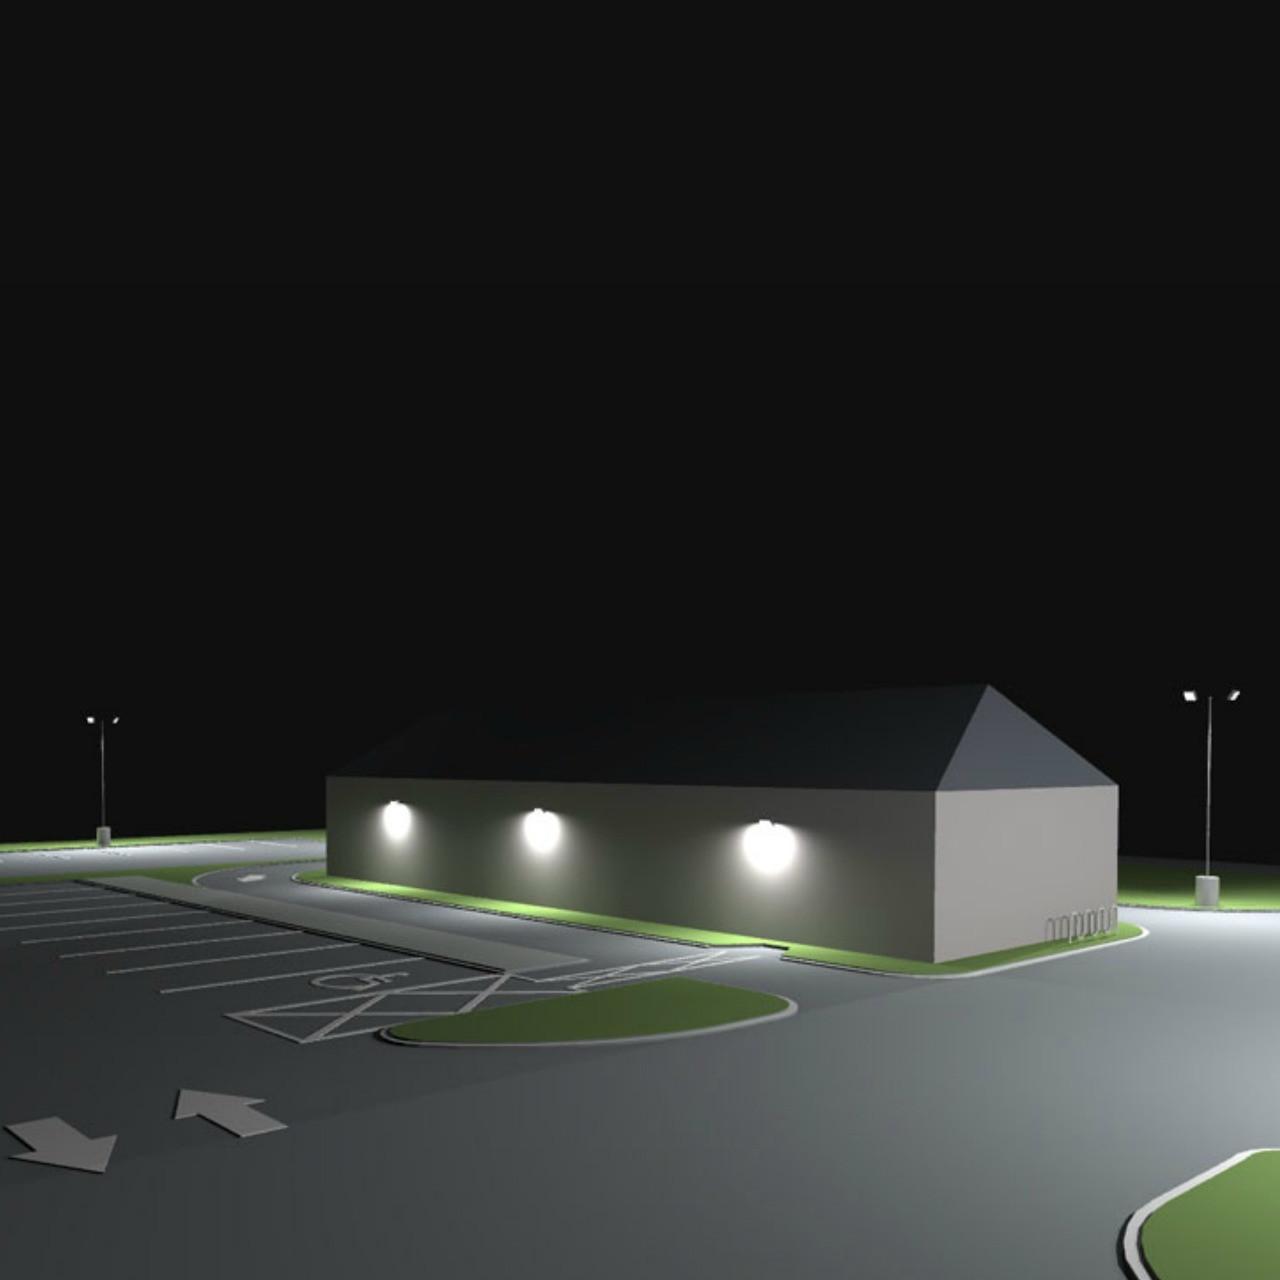 Spacing Of Parking Lot Lights: #1161: Restaurant Parking Lot Photometric Lighting Layout